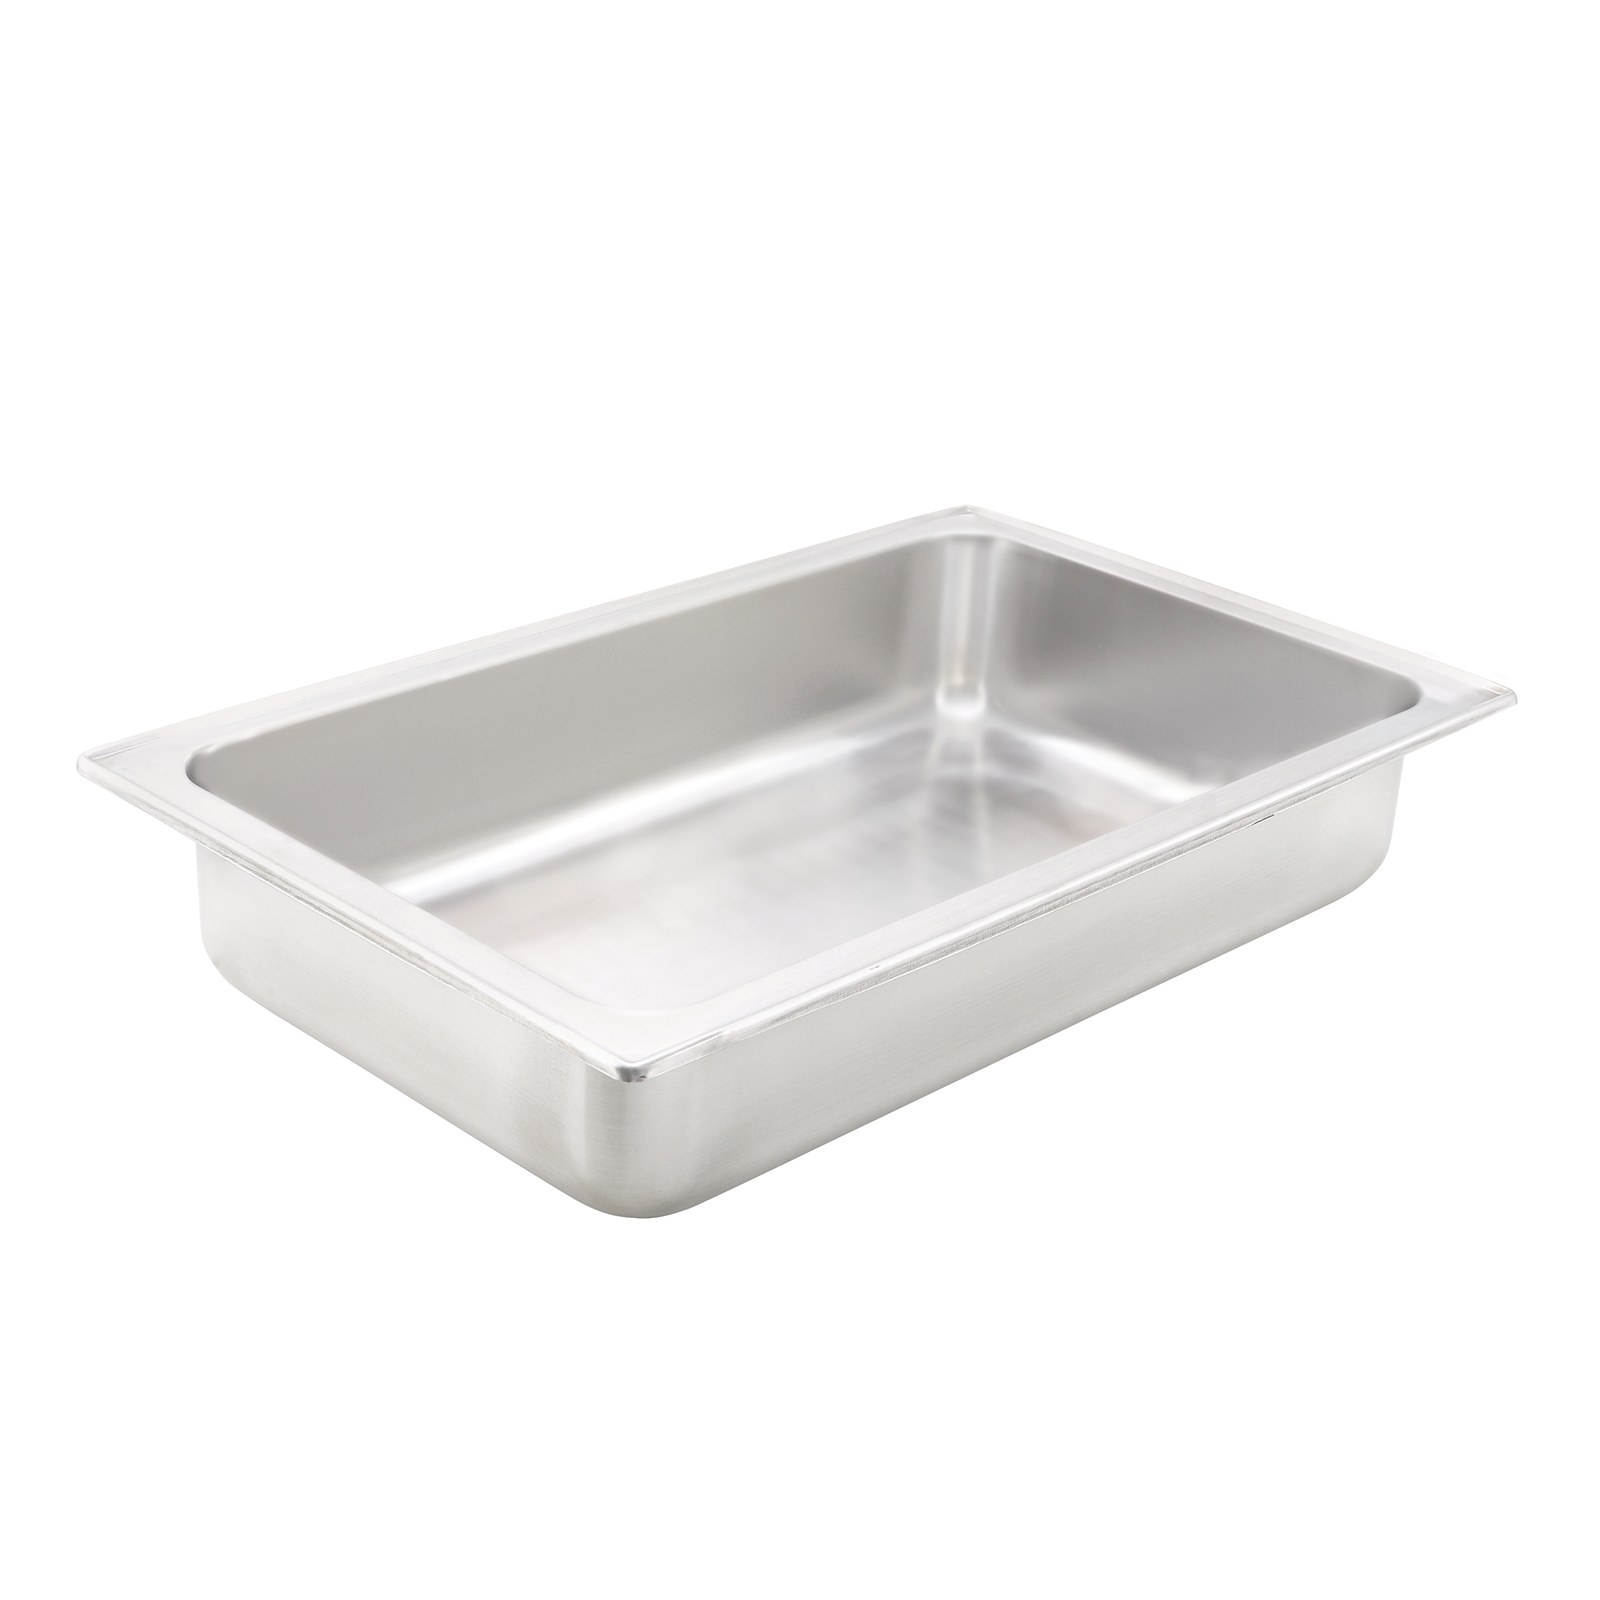 Winco C-WPF chafing dish pan